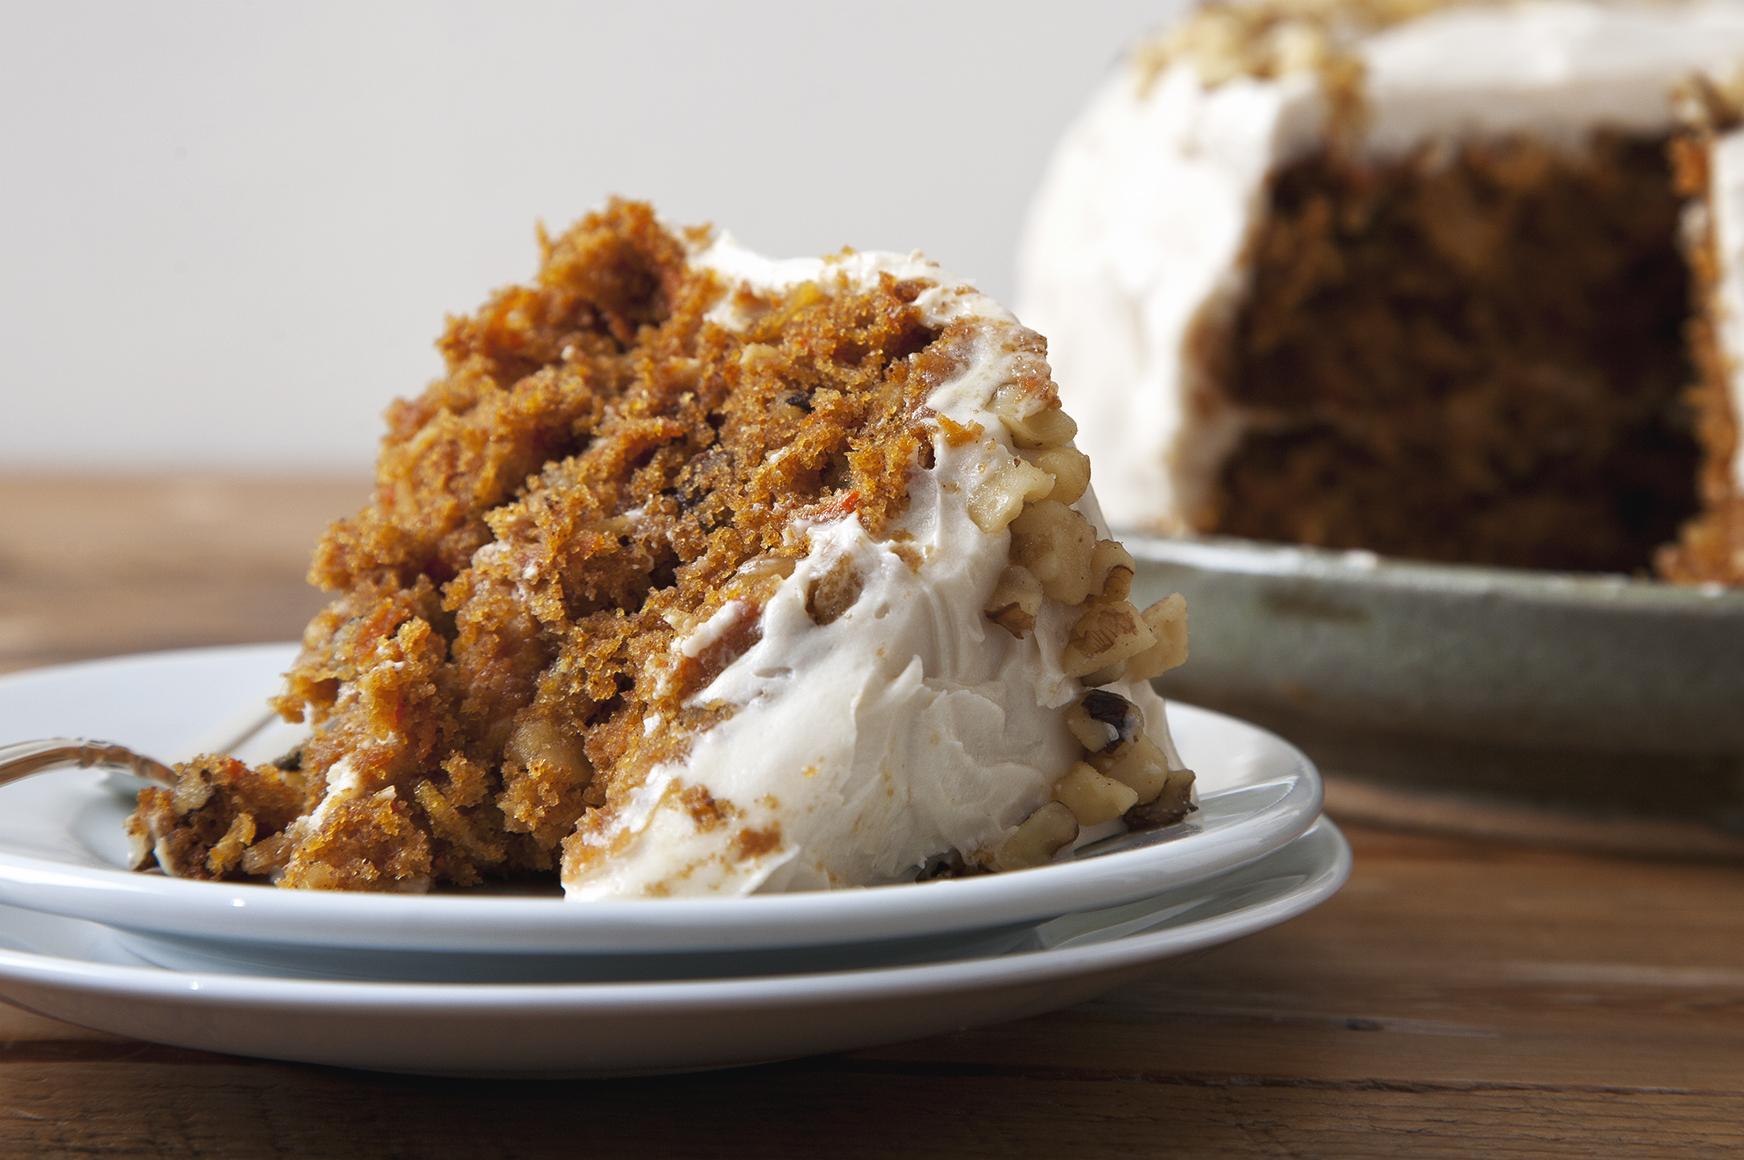 Hippie Vegan Carrot Cake with Pineapple & Cream Cheese Frosting! | picklesnhoney.com #vegan #carrotcake #cake #dessert #pineapple #recipe